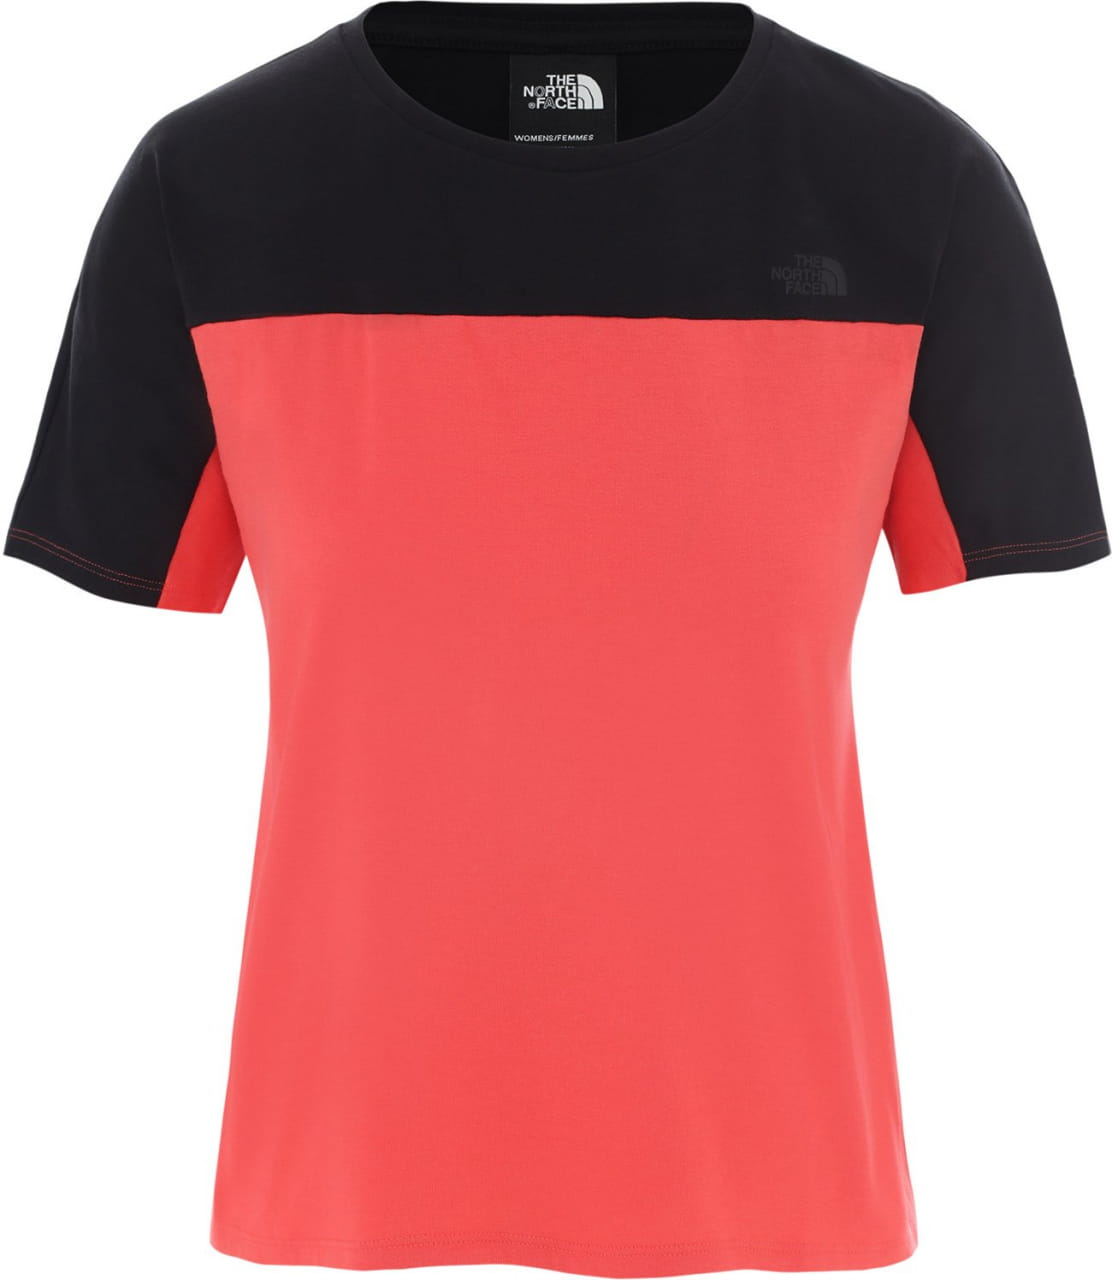 Dámské tričko The North Face Women's North Dome T-Shirt